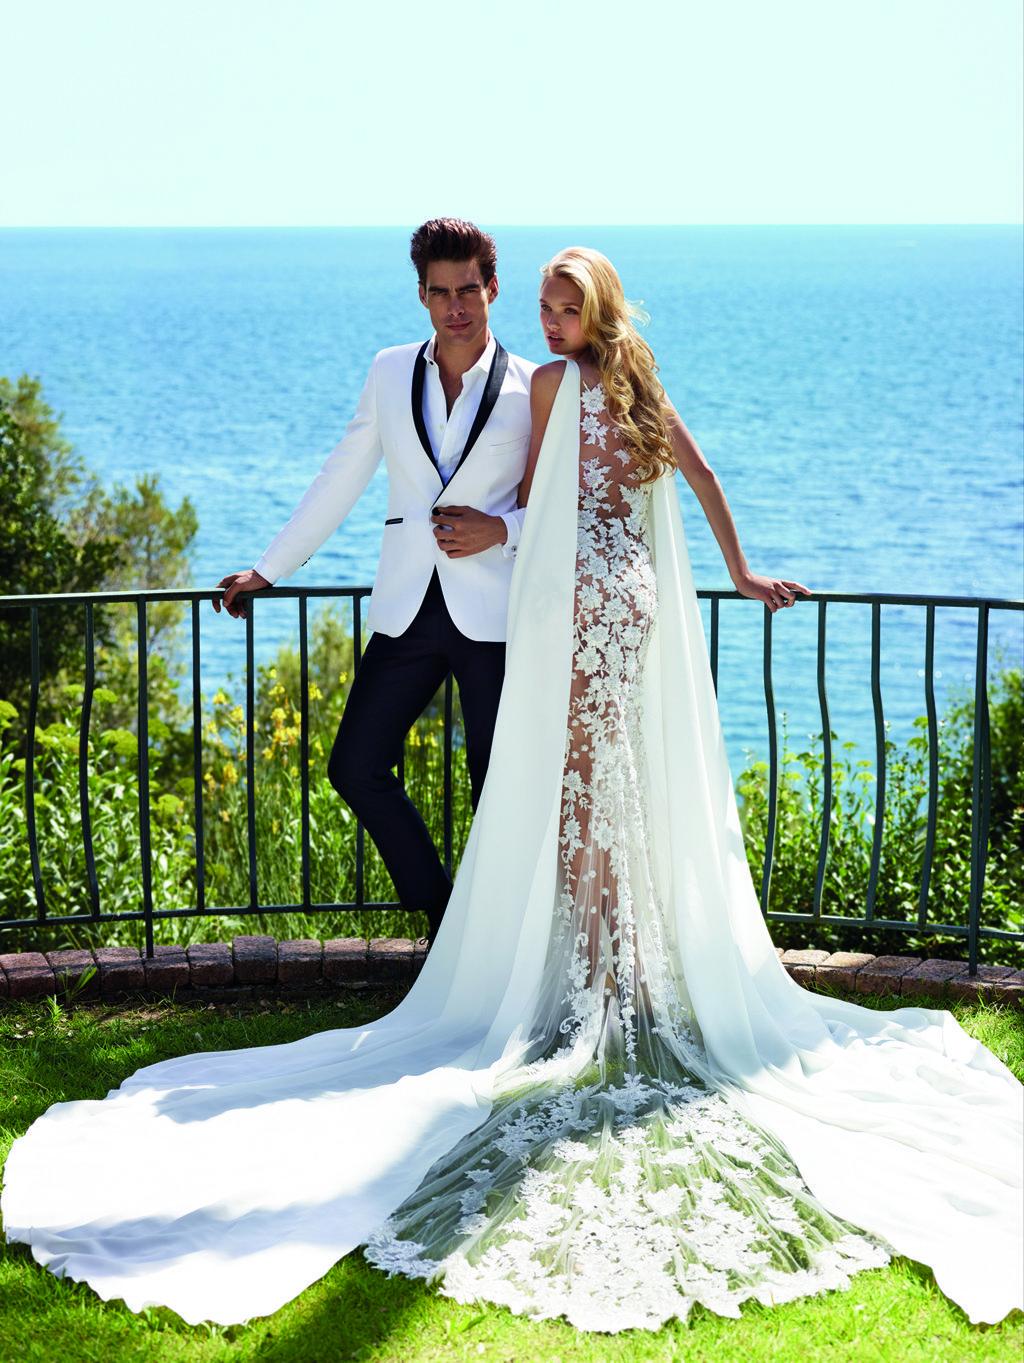 Will you marry me?, Pronovias 2017 - Quiero una boda perfecta